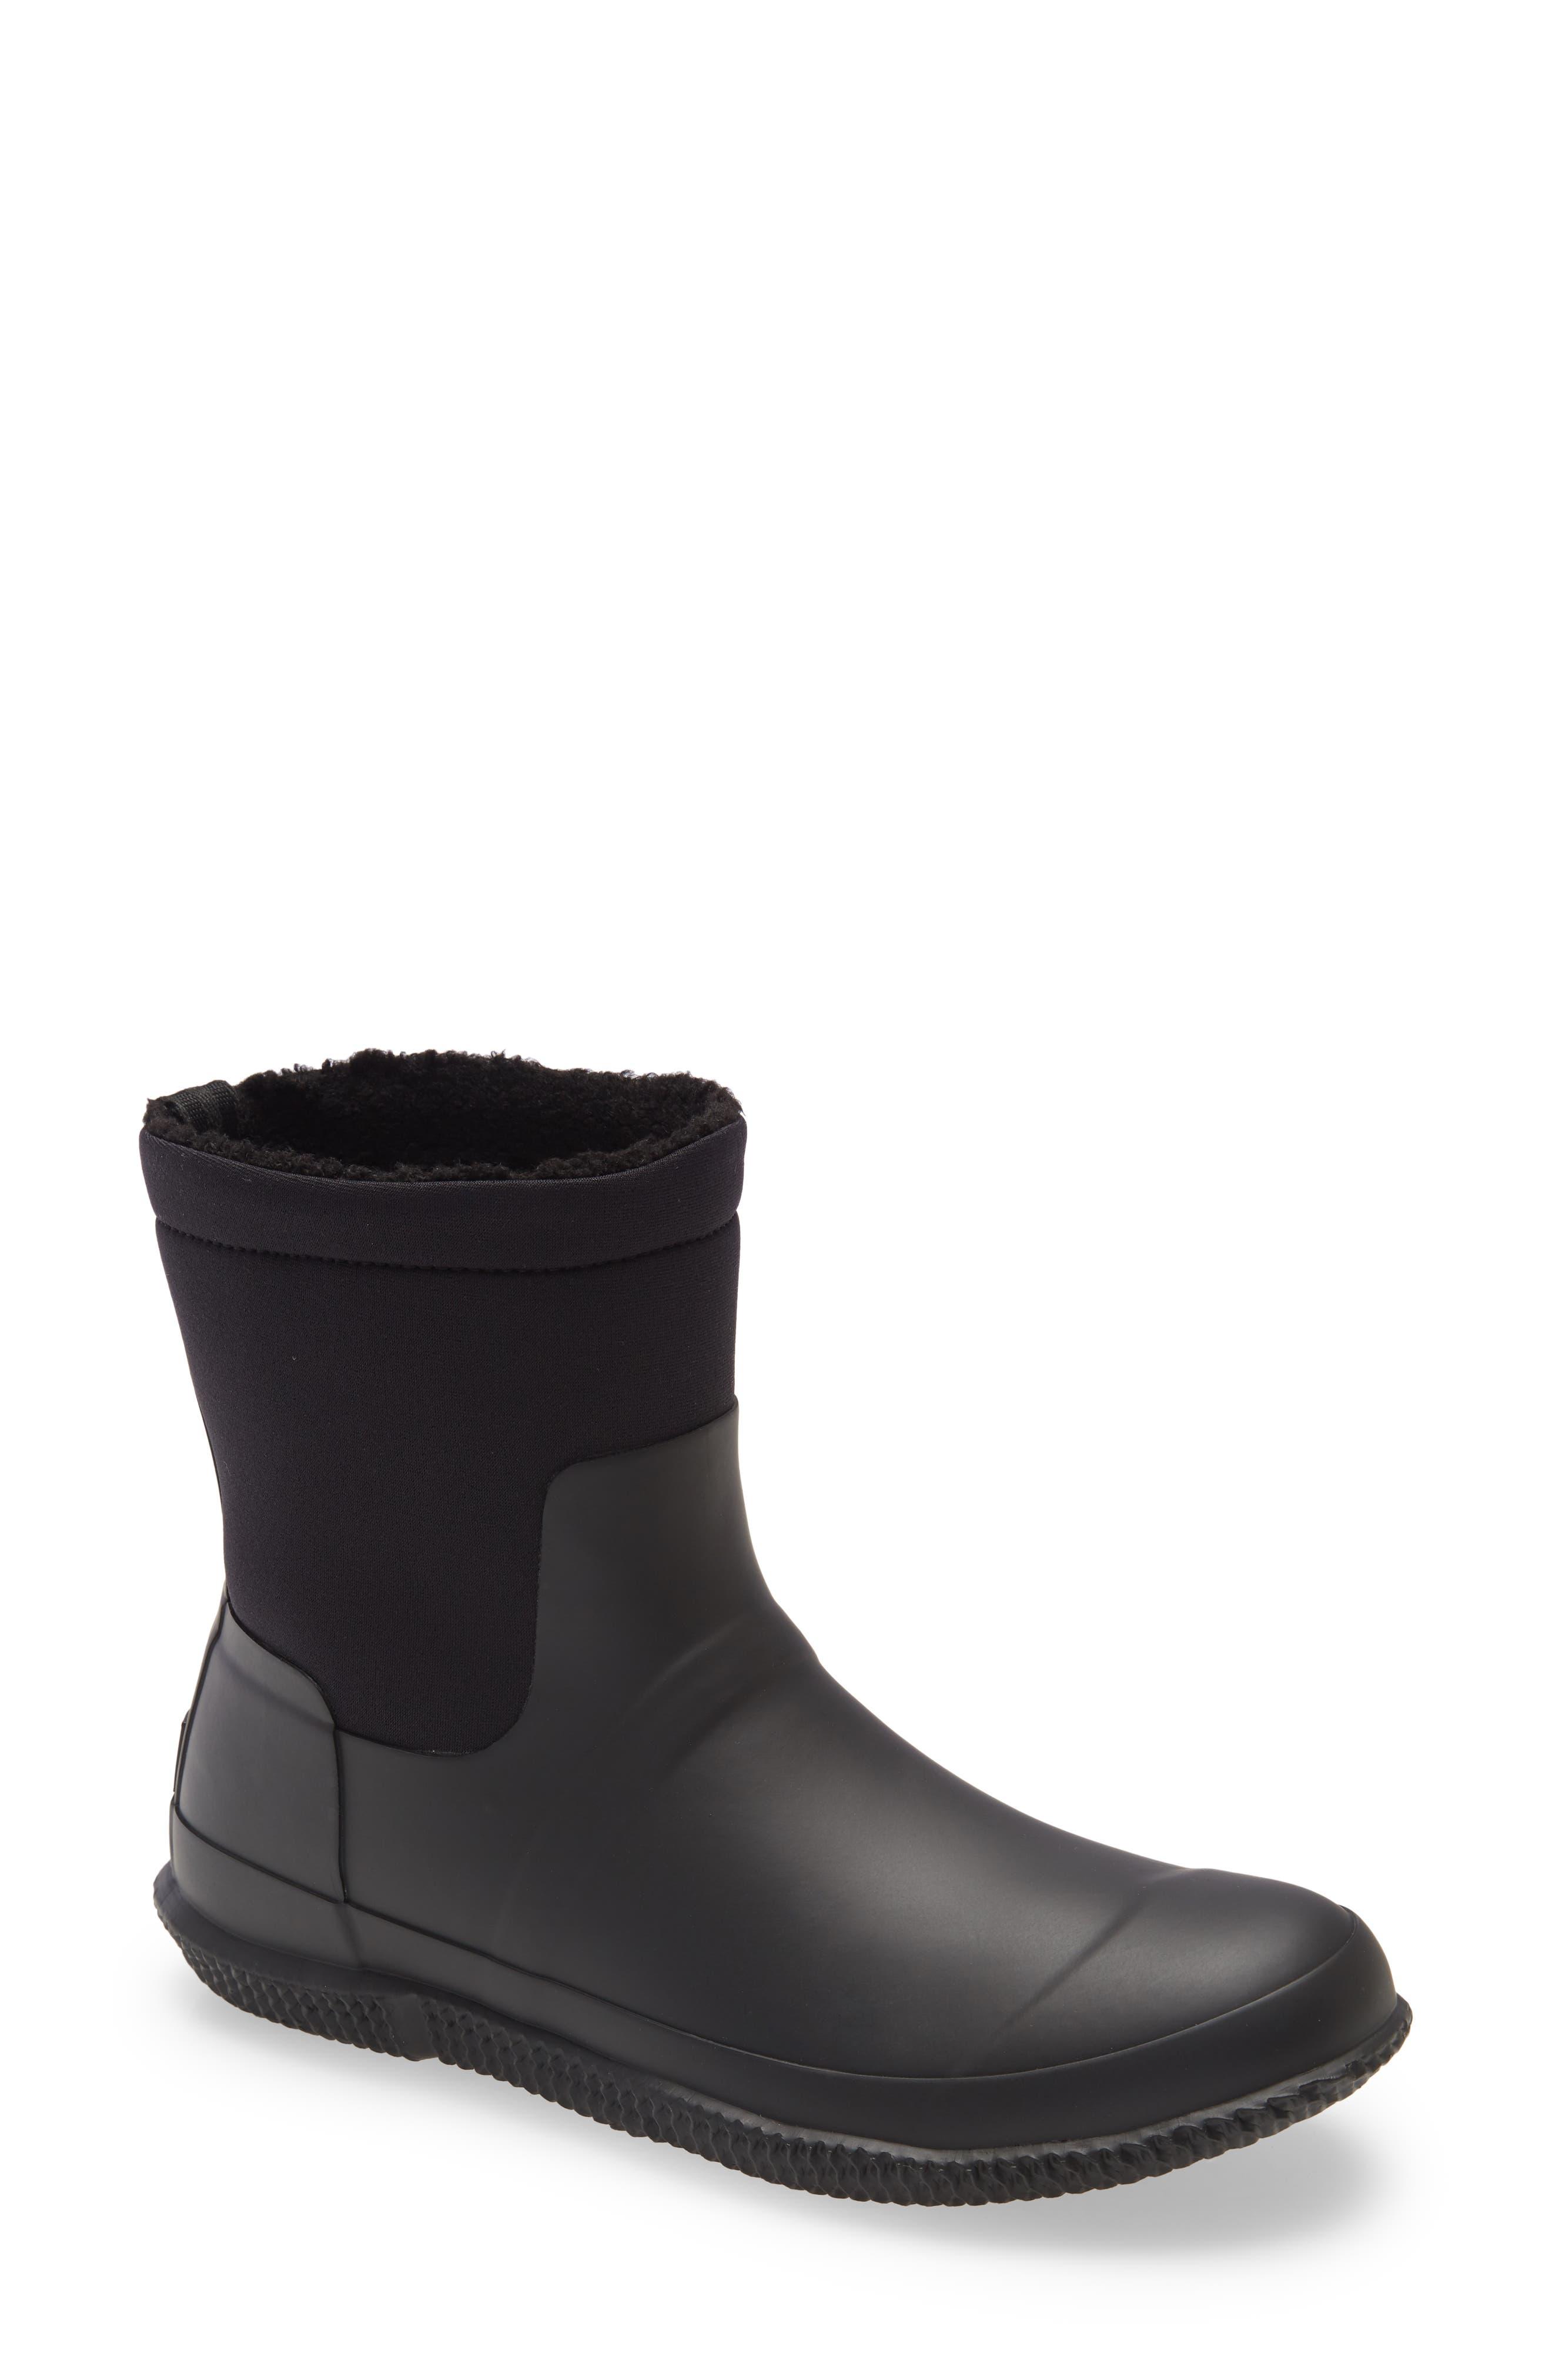 Original Waterproof Boot